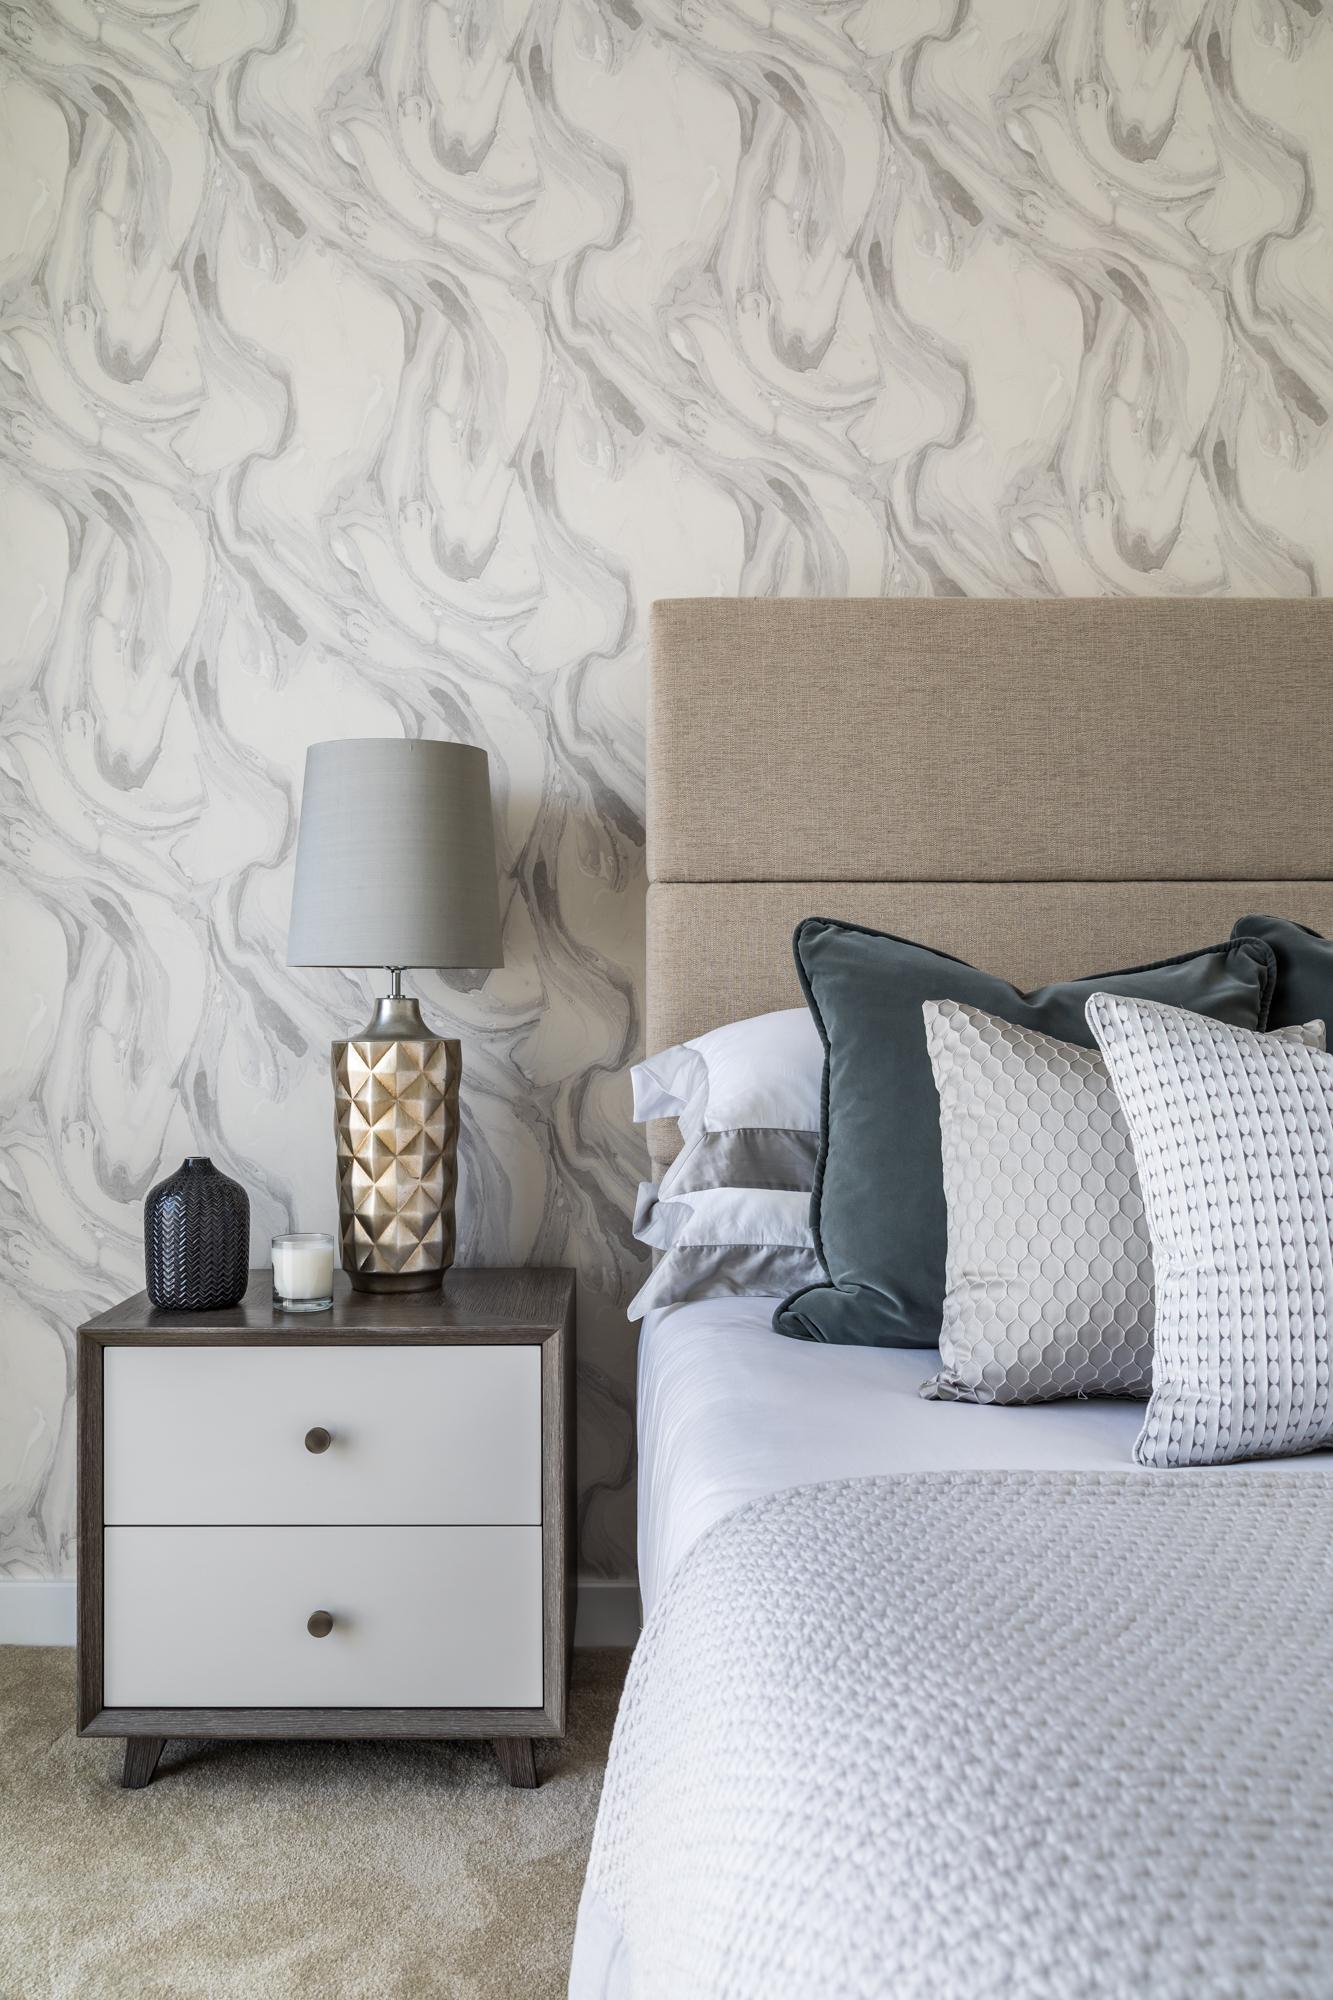 jonathan bond photography, sara slade interiors, bedside cabinet & lamps, cambridgeshire